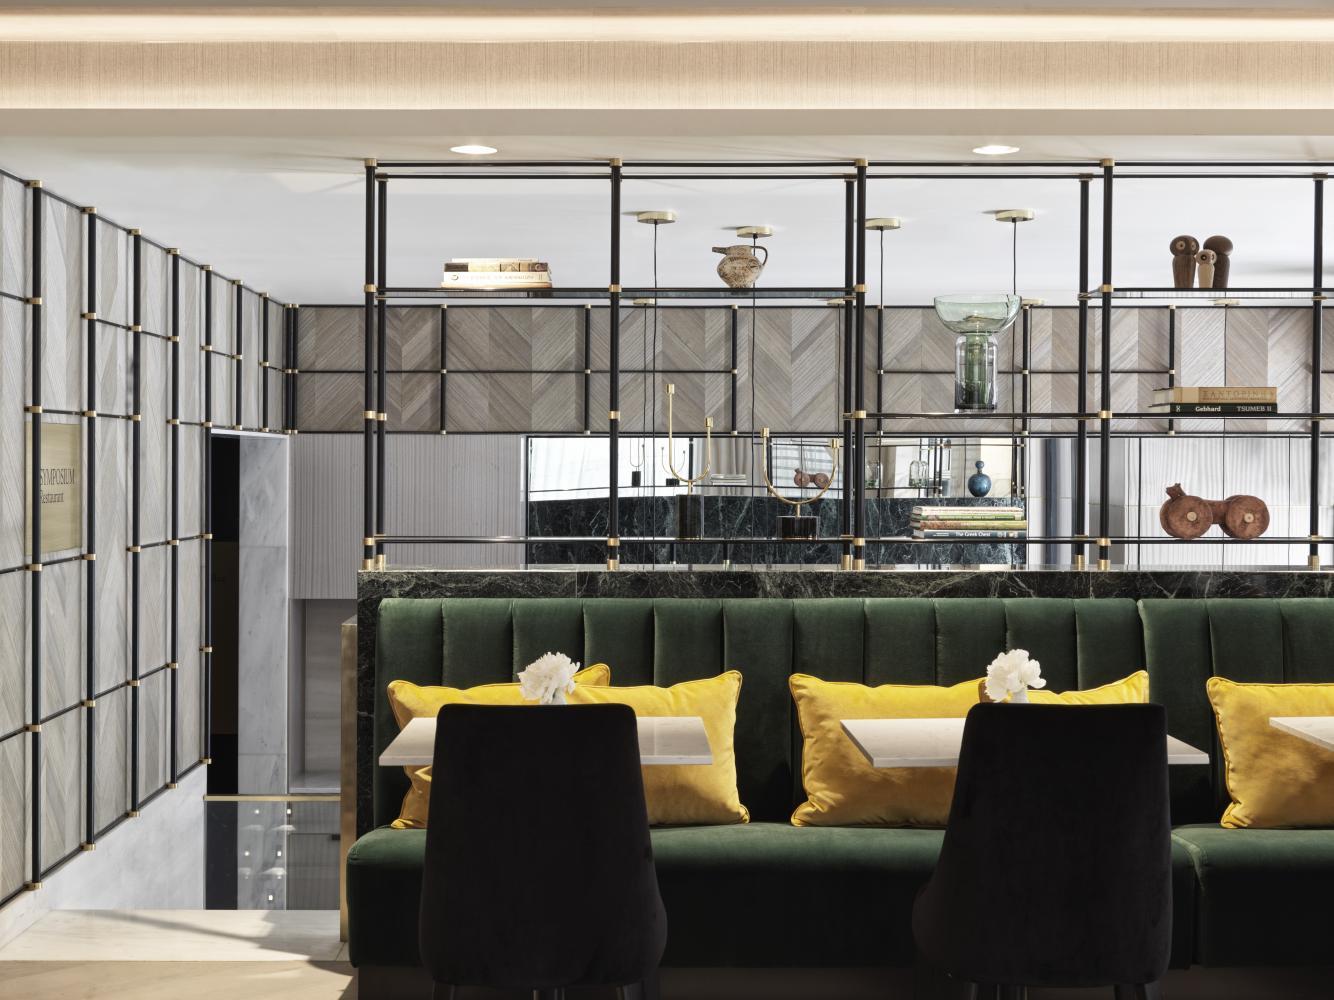 Academia Hotel of Athens - Image 11